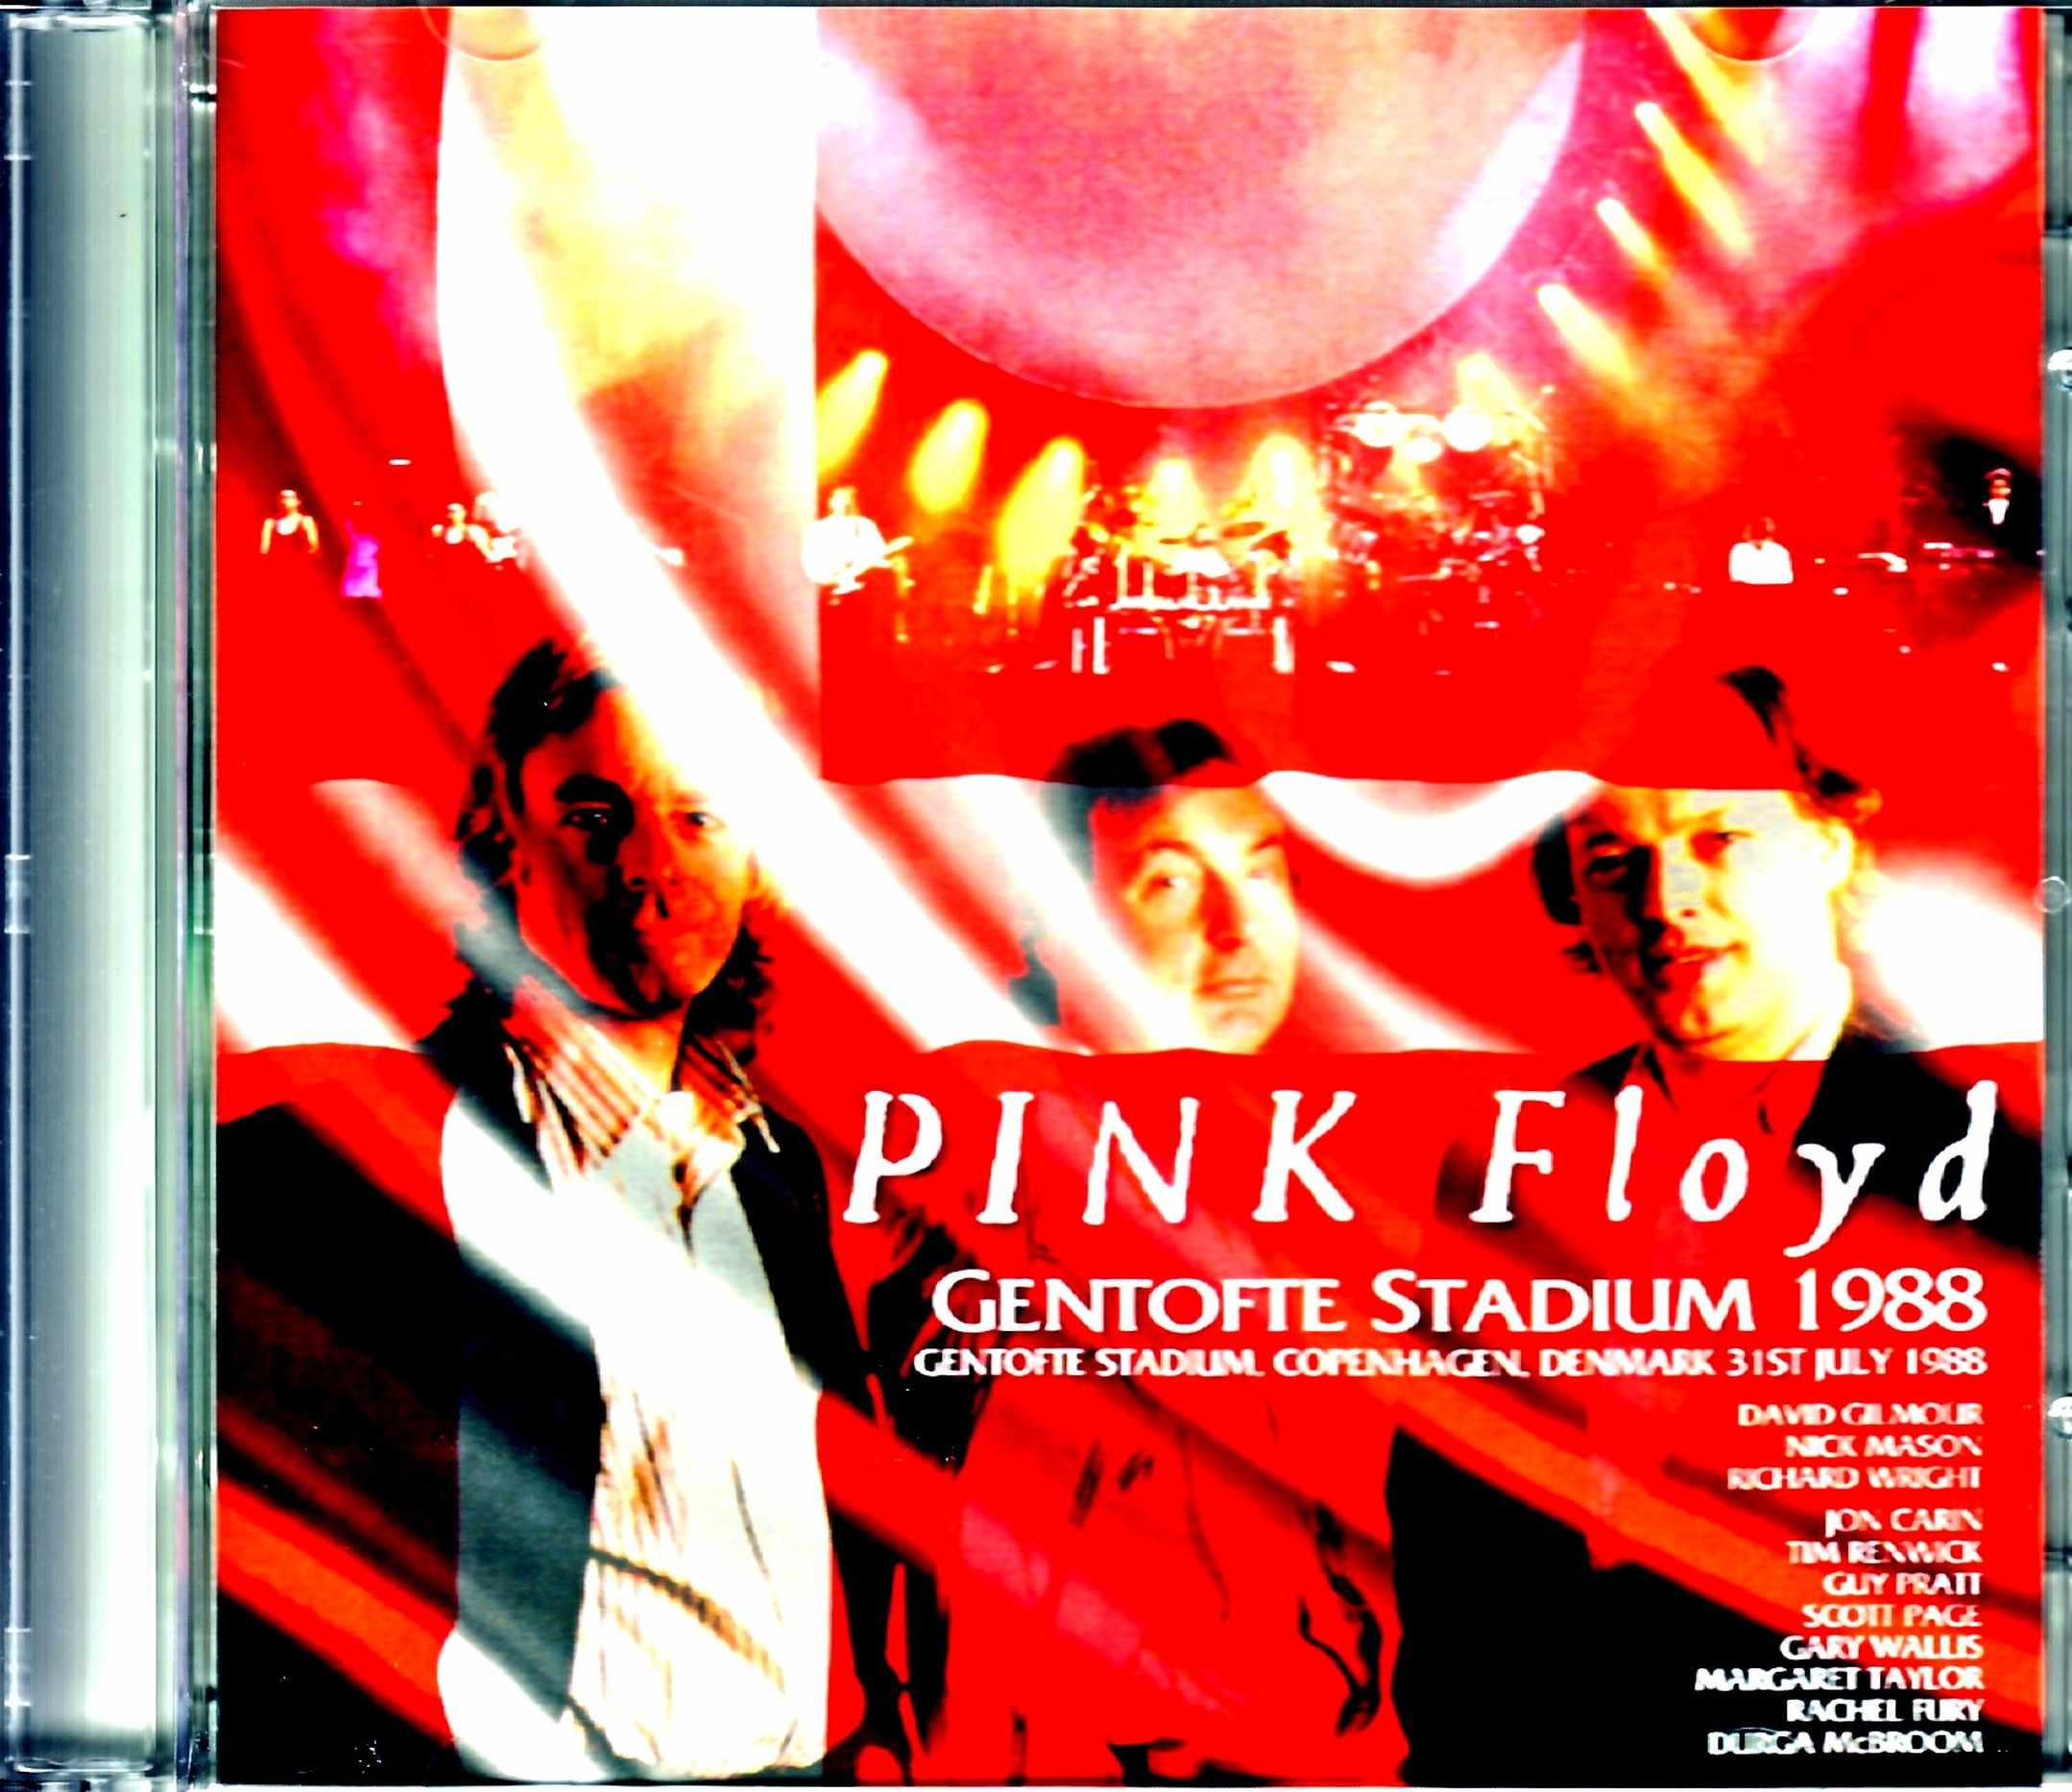 Pink Floyd ピンク・フロイド/Denmark 1988 Complete